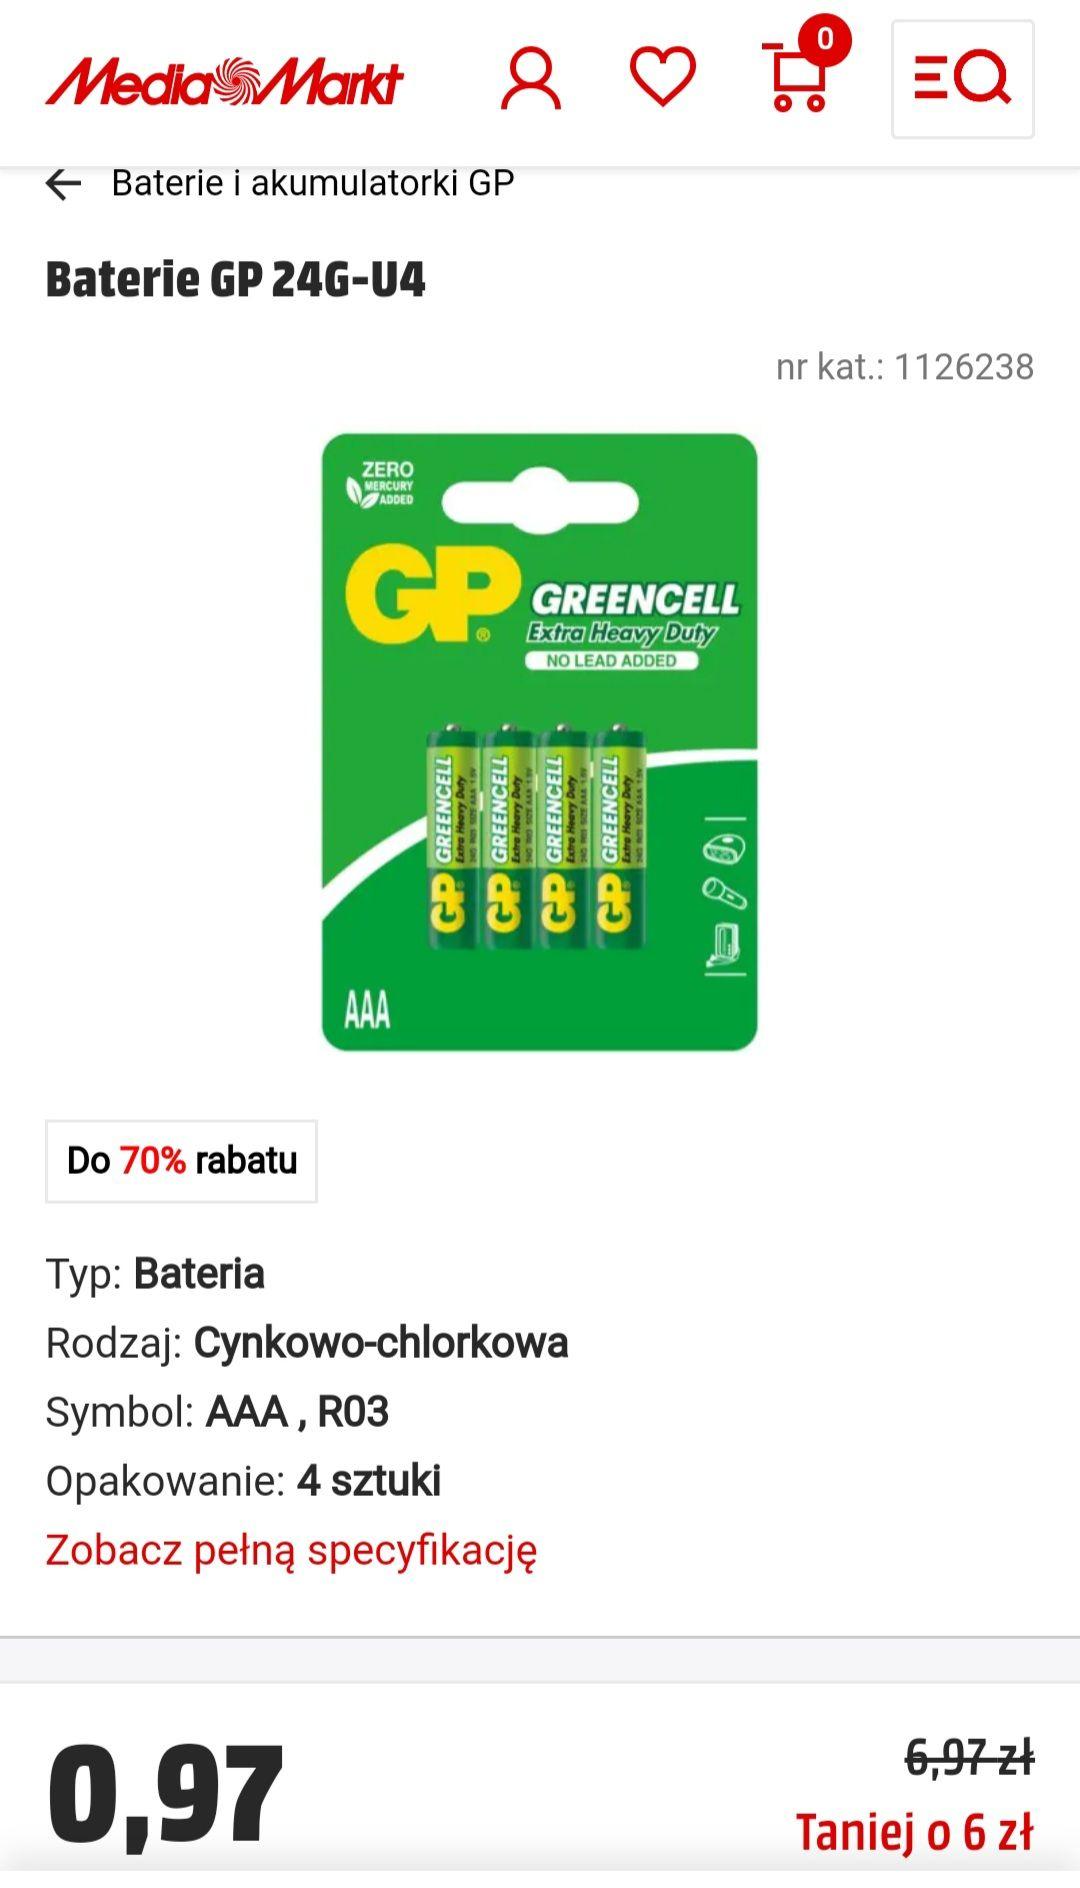 Baterie GP 4 sztuki (0,24gr./1baterie) i Duracell 2szt. (0,47gr./1baterie) - Media Markt